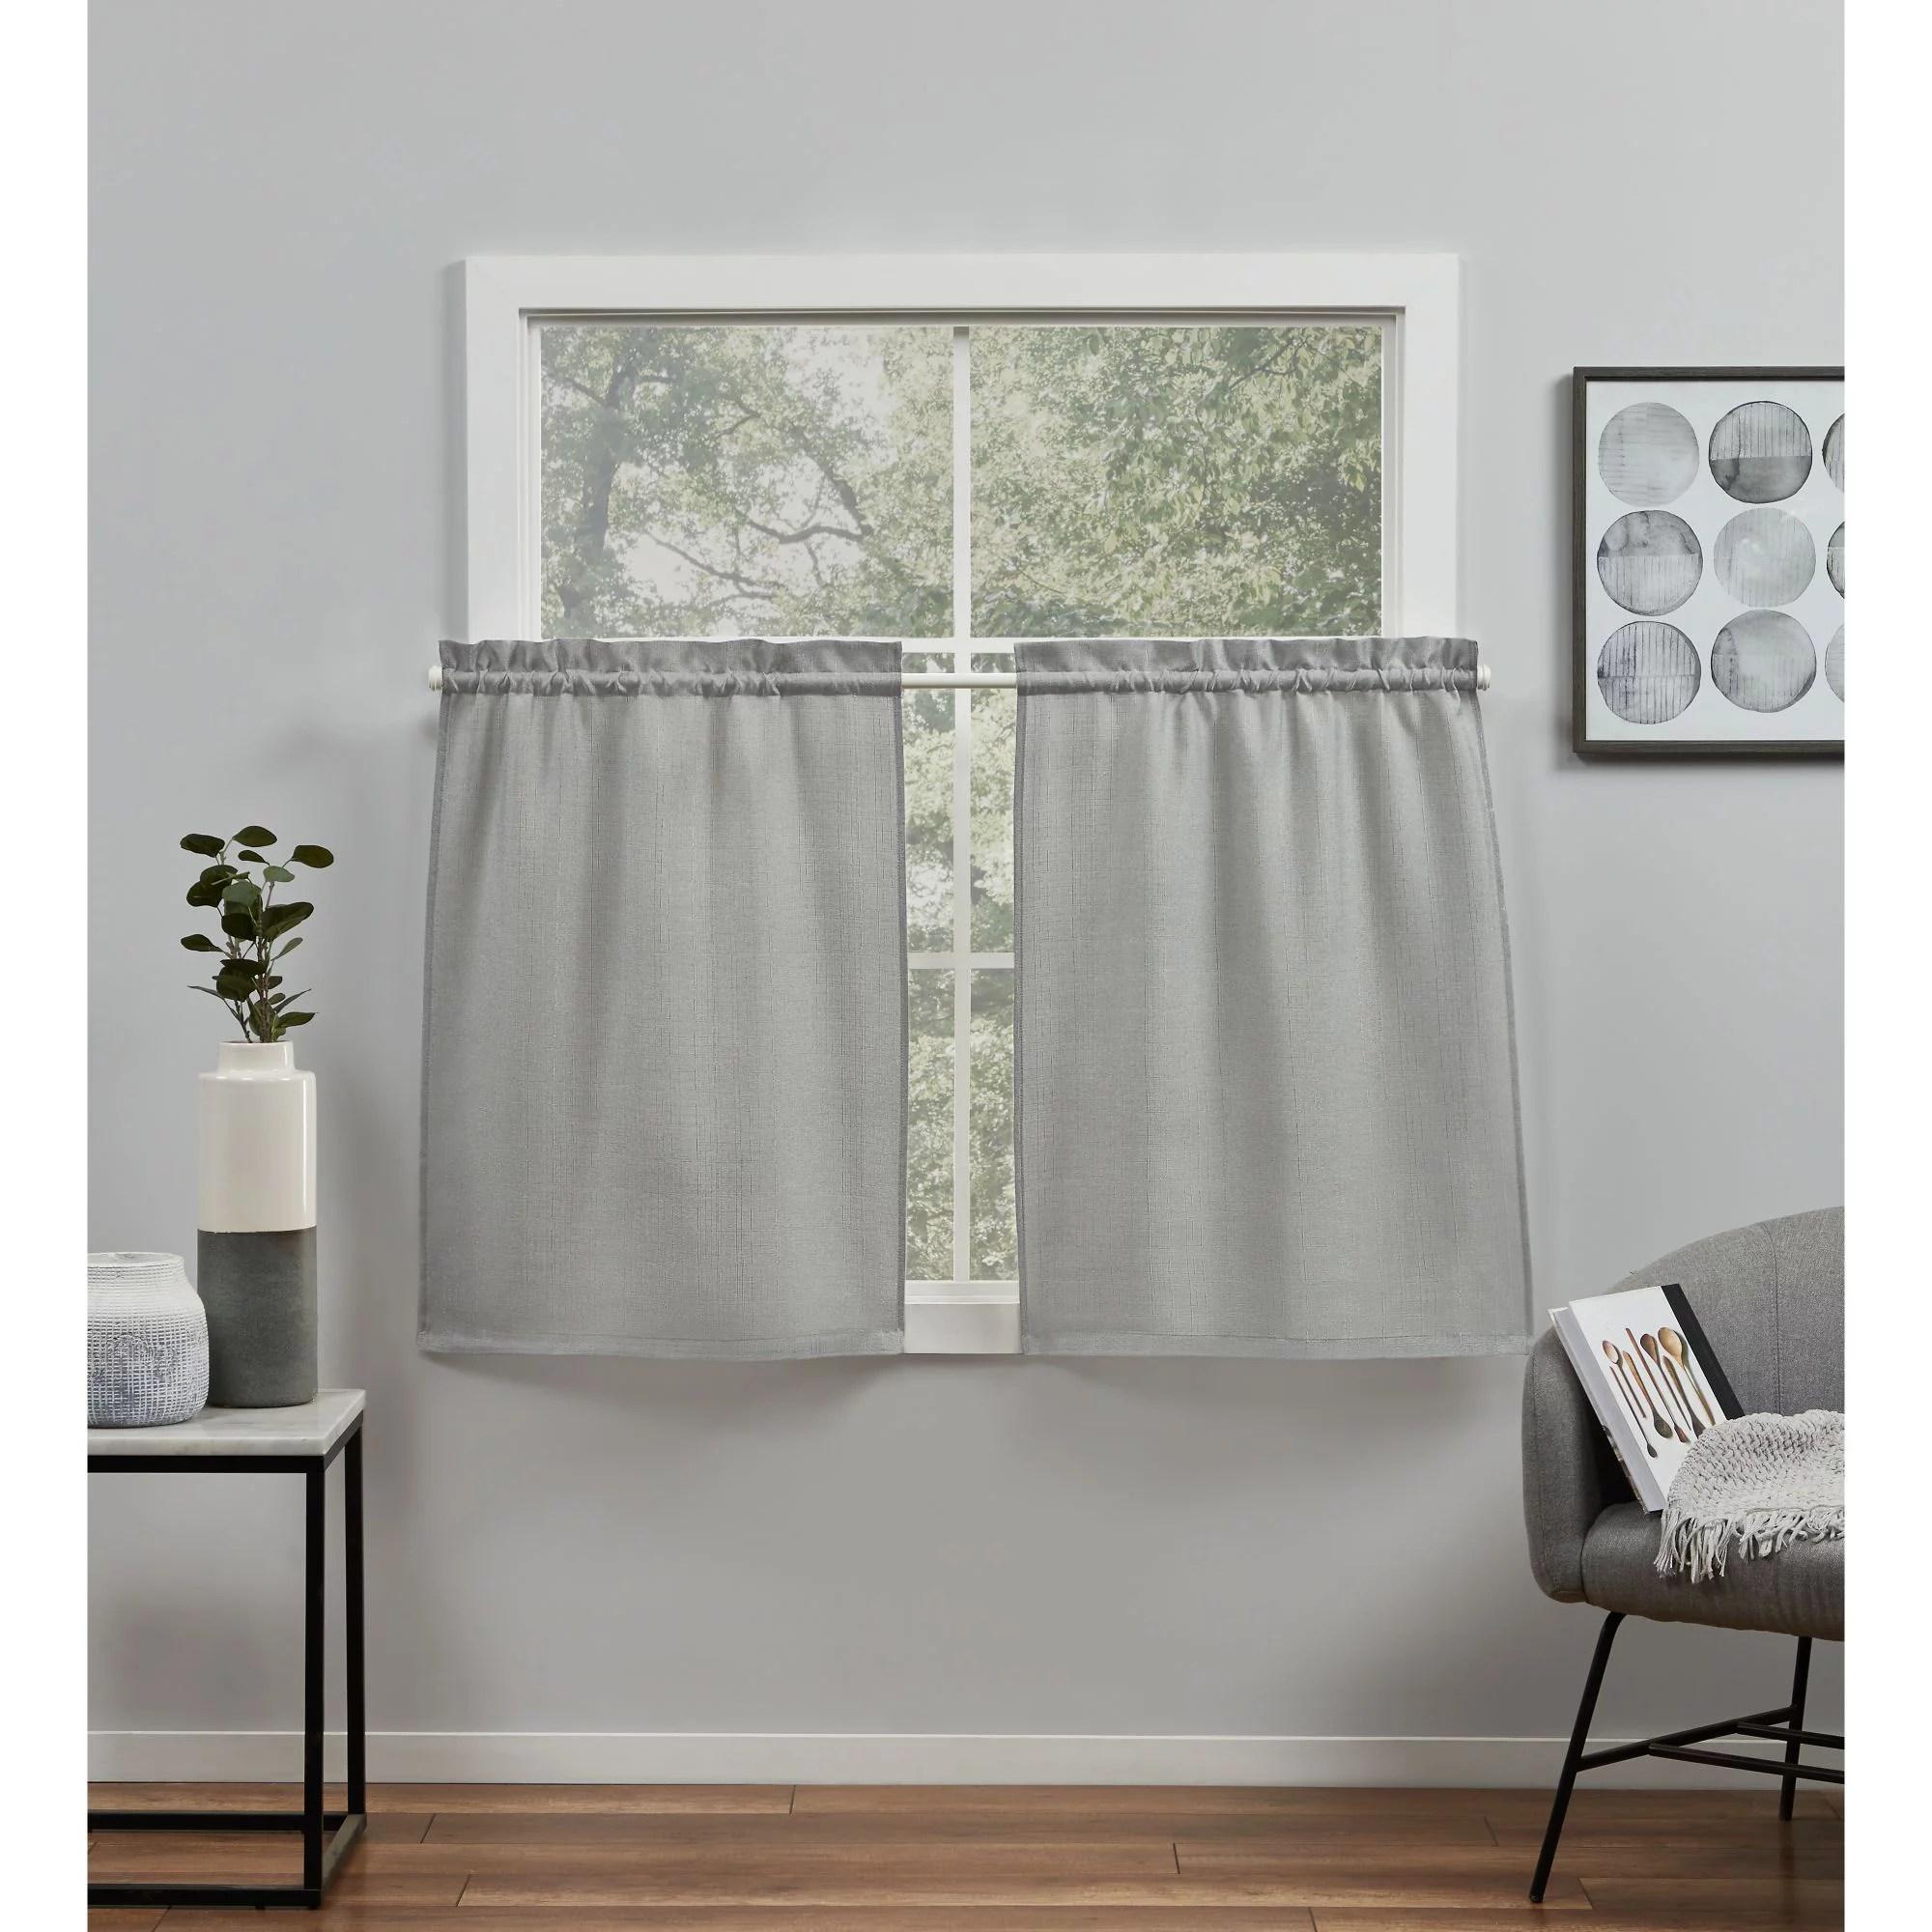 exclusive home curtains loha light filtering rod pocket tier curtain panel pair 26 x 36 dove grey set of 2 walmart com